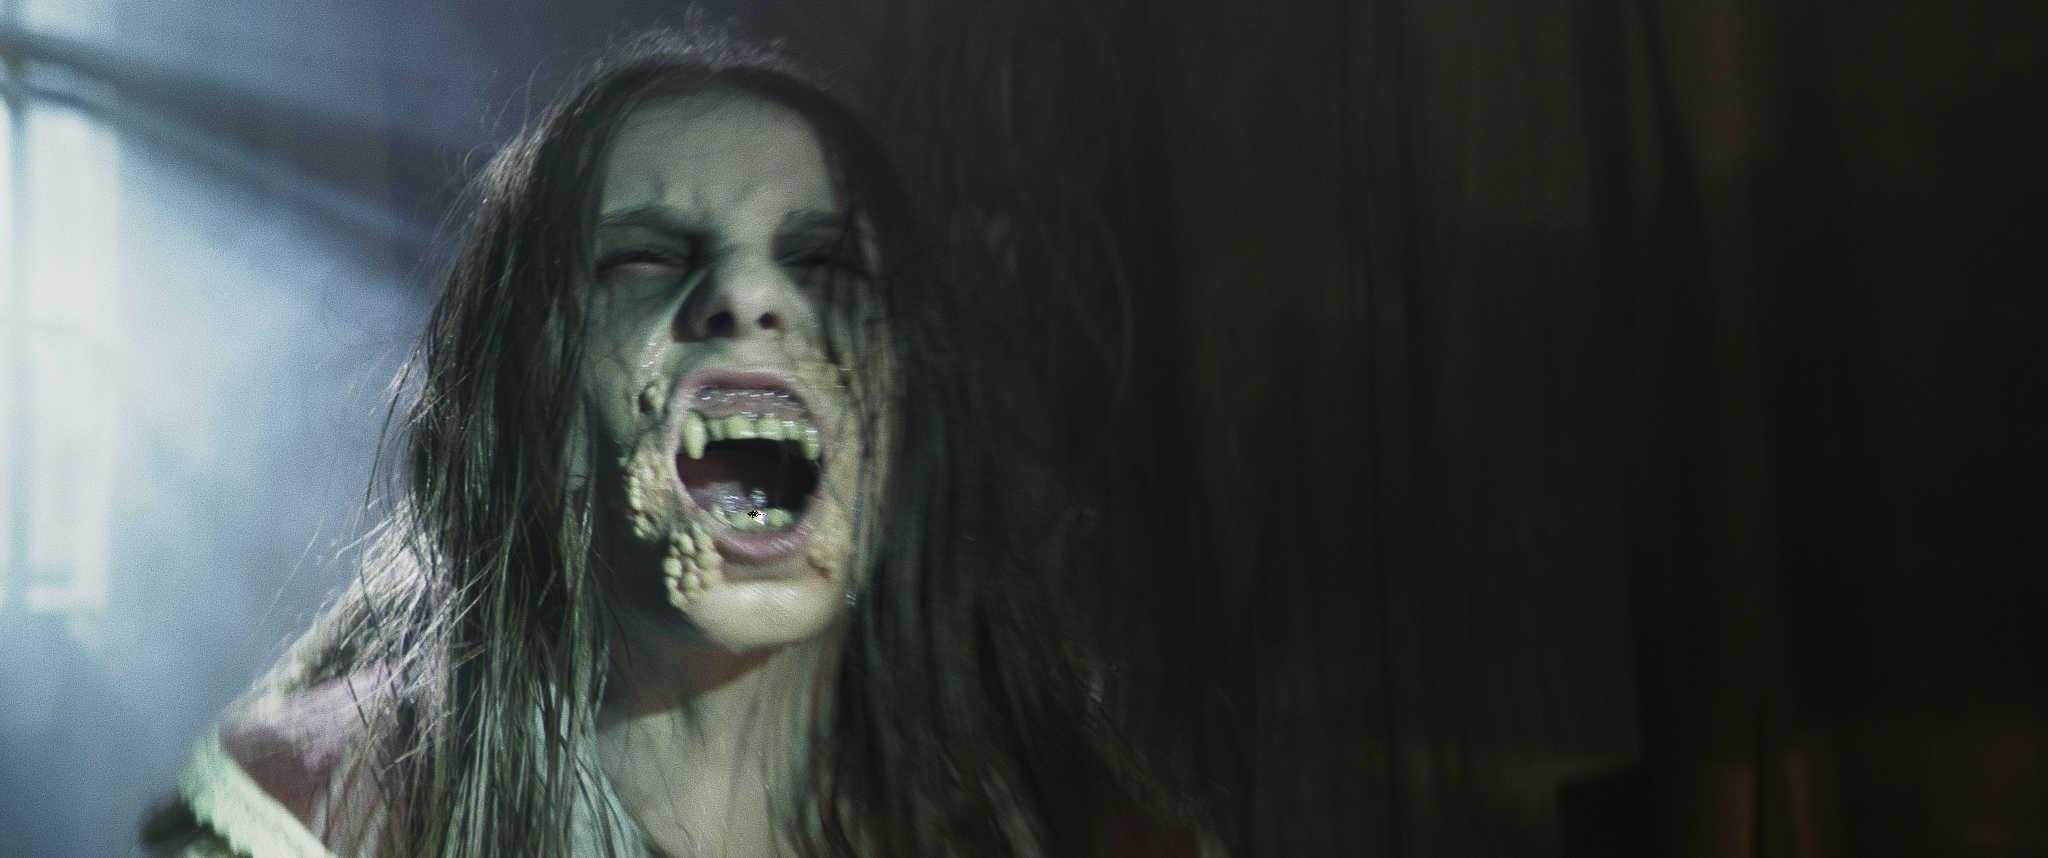 Joseph's Review: Vurdalak Blood (Fantaspoa 2021)